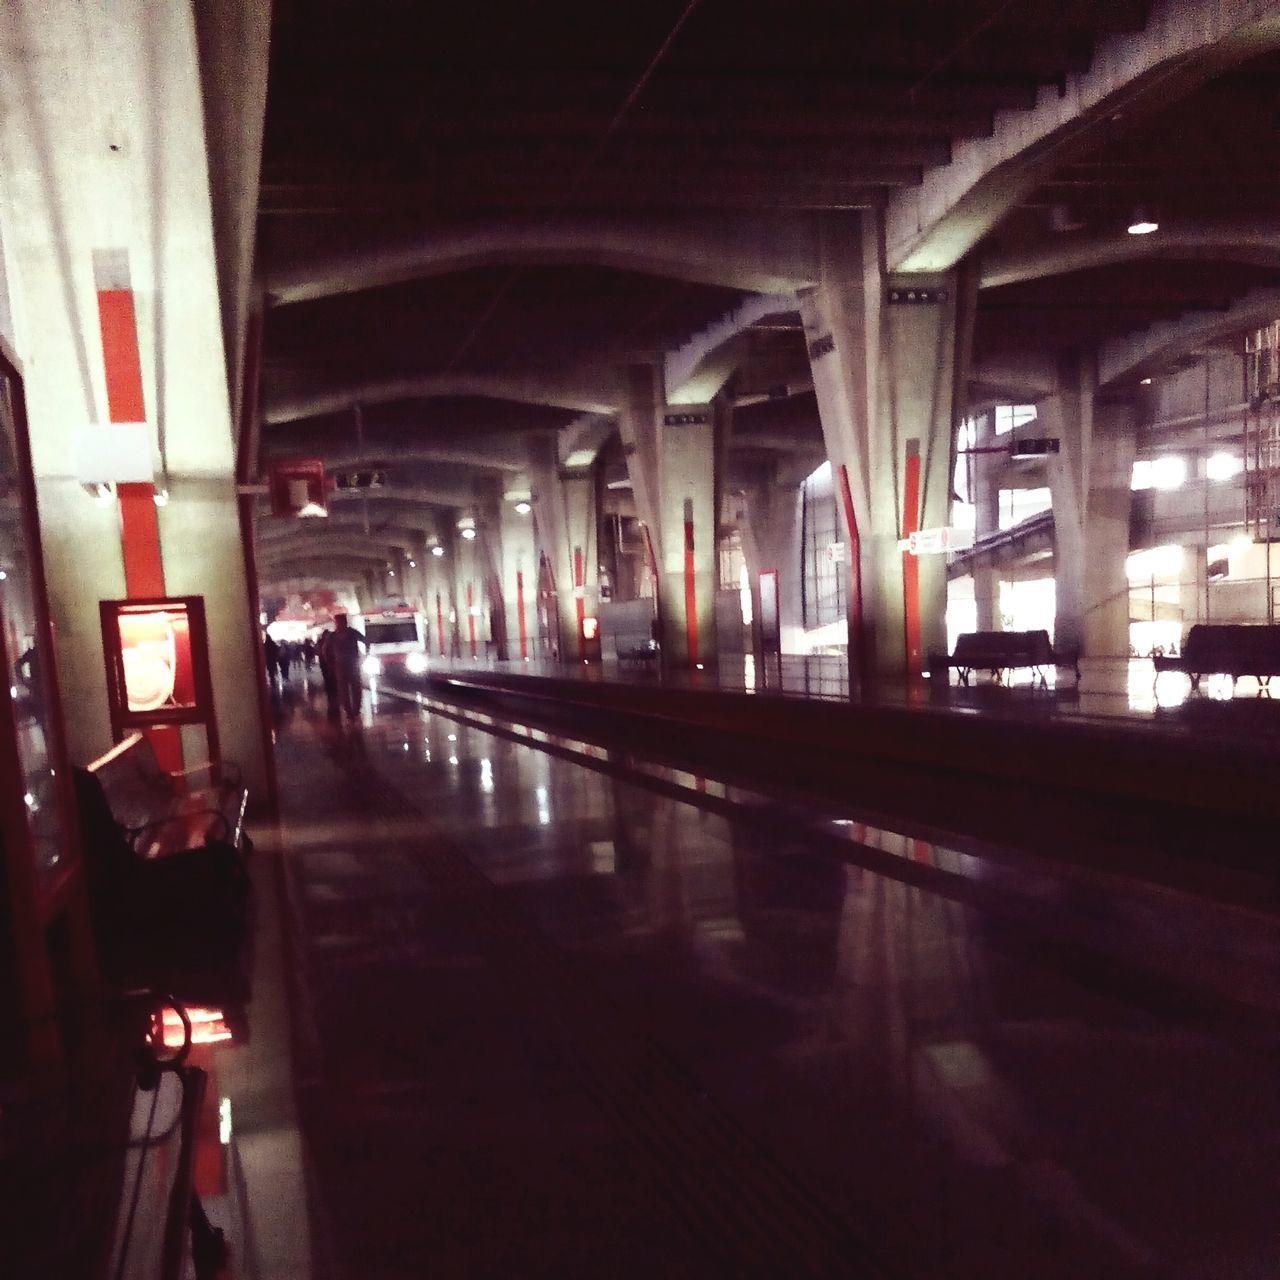 Architecture Built Structure Transportation Indoors  Suburbano Buenavista Mexico City